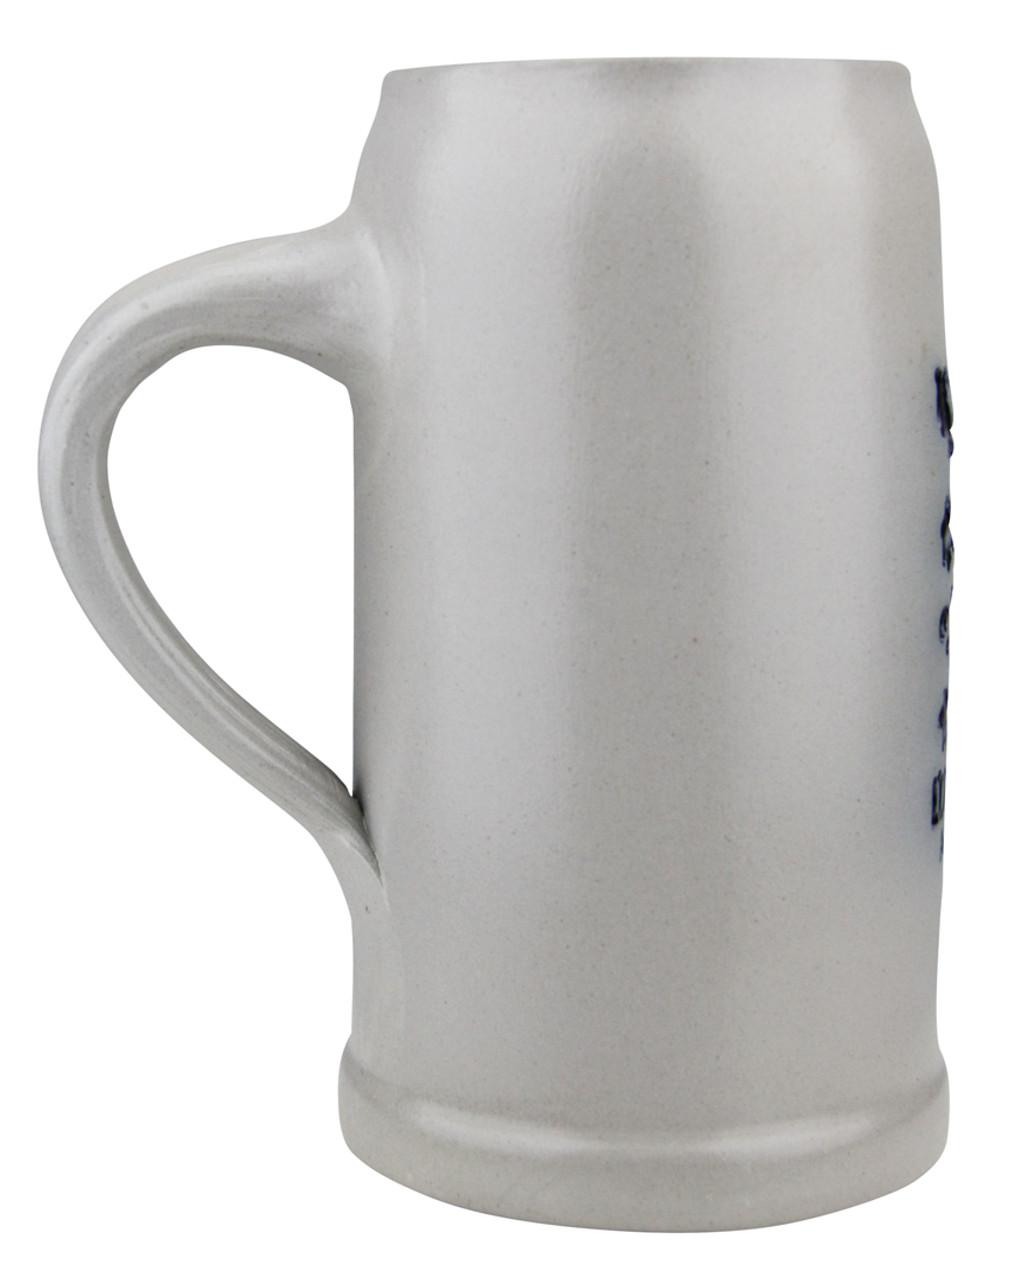 Stoneware Lowenbrau Brewery Mug with 1 Liter Fill Line Mark